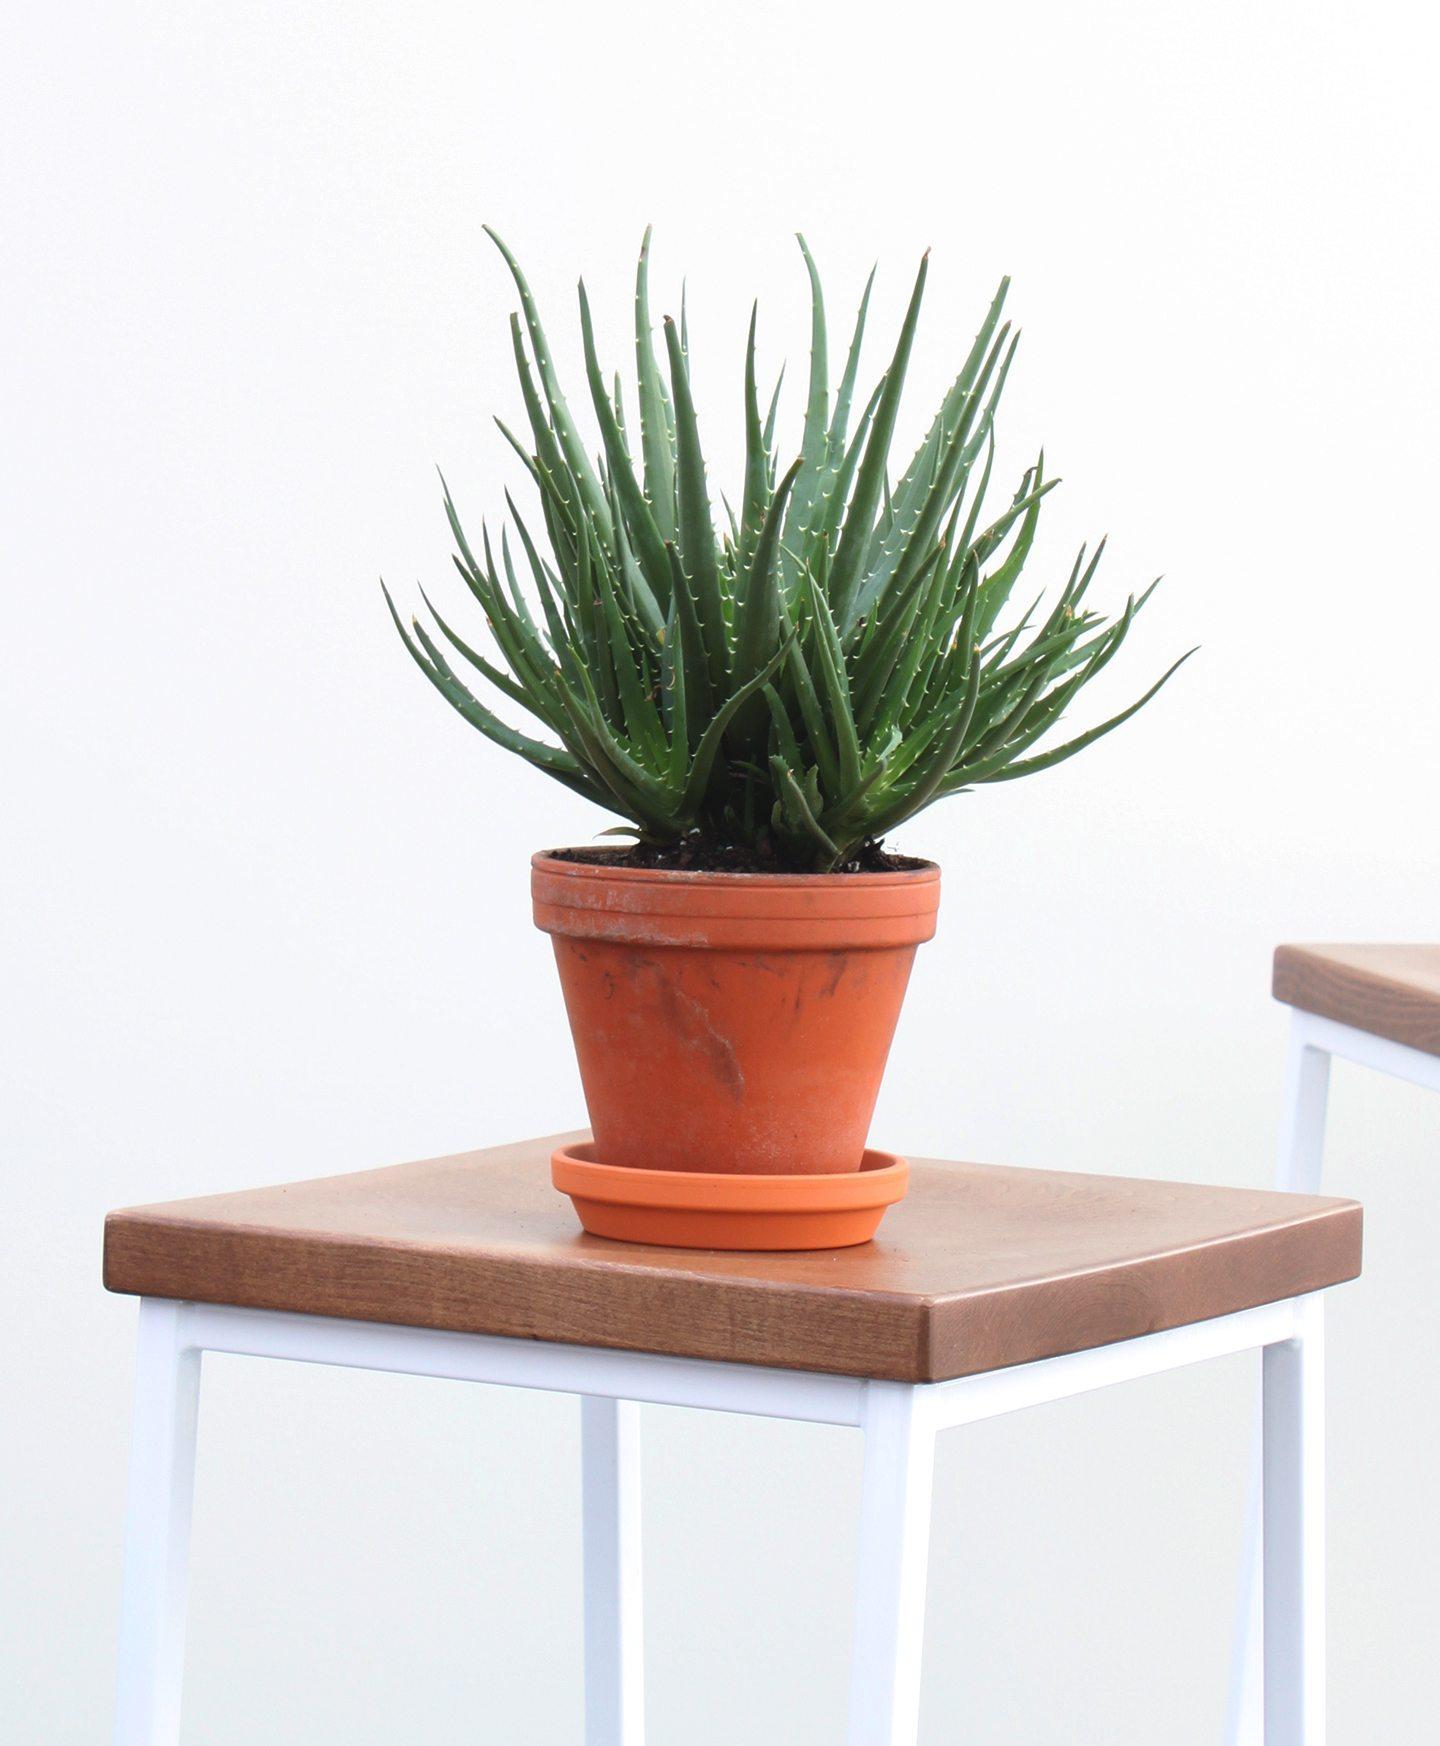 13 Best Indoor Succulents to Grow Now! HedgeHog Aloe #Succulents #Garden #Gardening #HousePlants #Decor #HomeDecor #GrowYourOwn #Affordable #DIY #BudgetFriendly